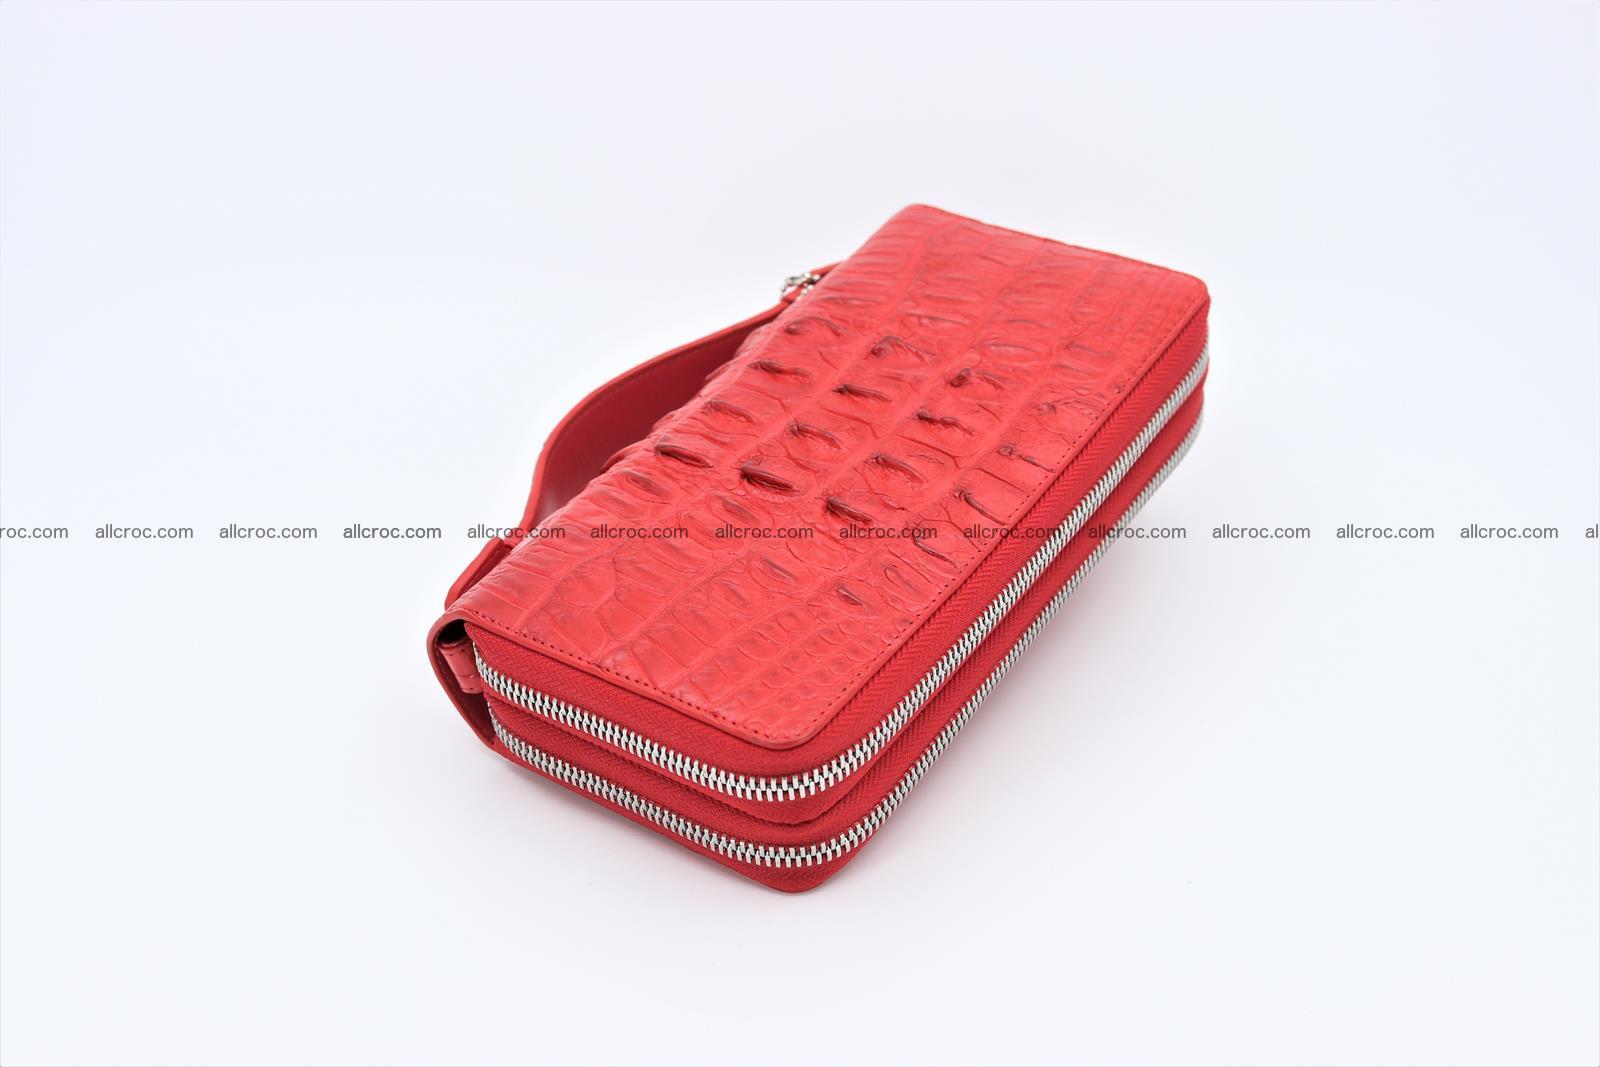 Crocodile skin clutch red color 2 zips 1263 Foto 3